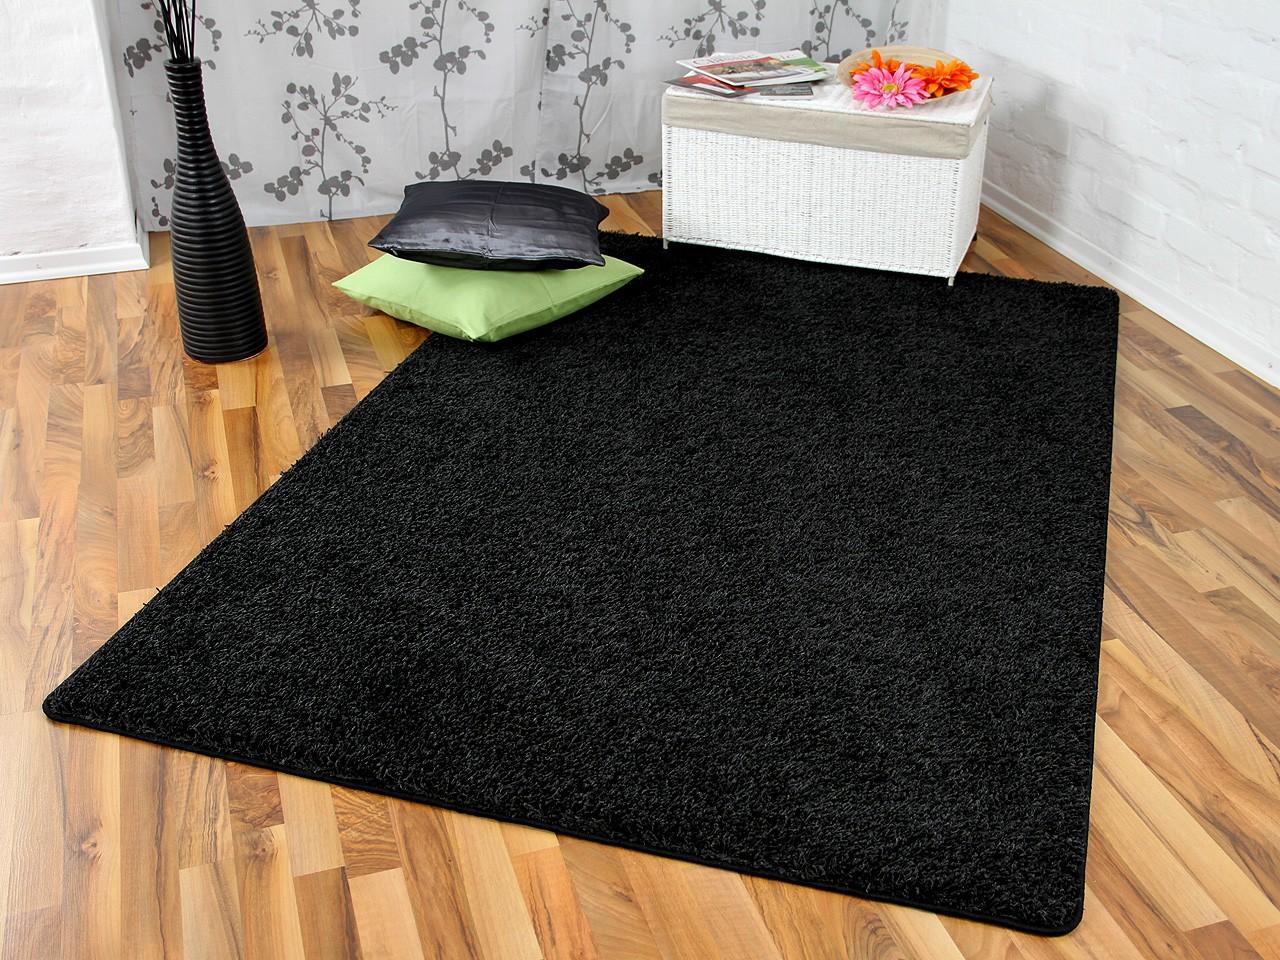 hochflor langflor teppich shaggy nova schwarz. Black Bedroom Furniture Sets. Home Design Ideas